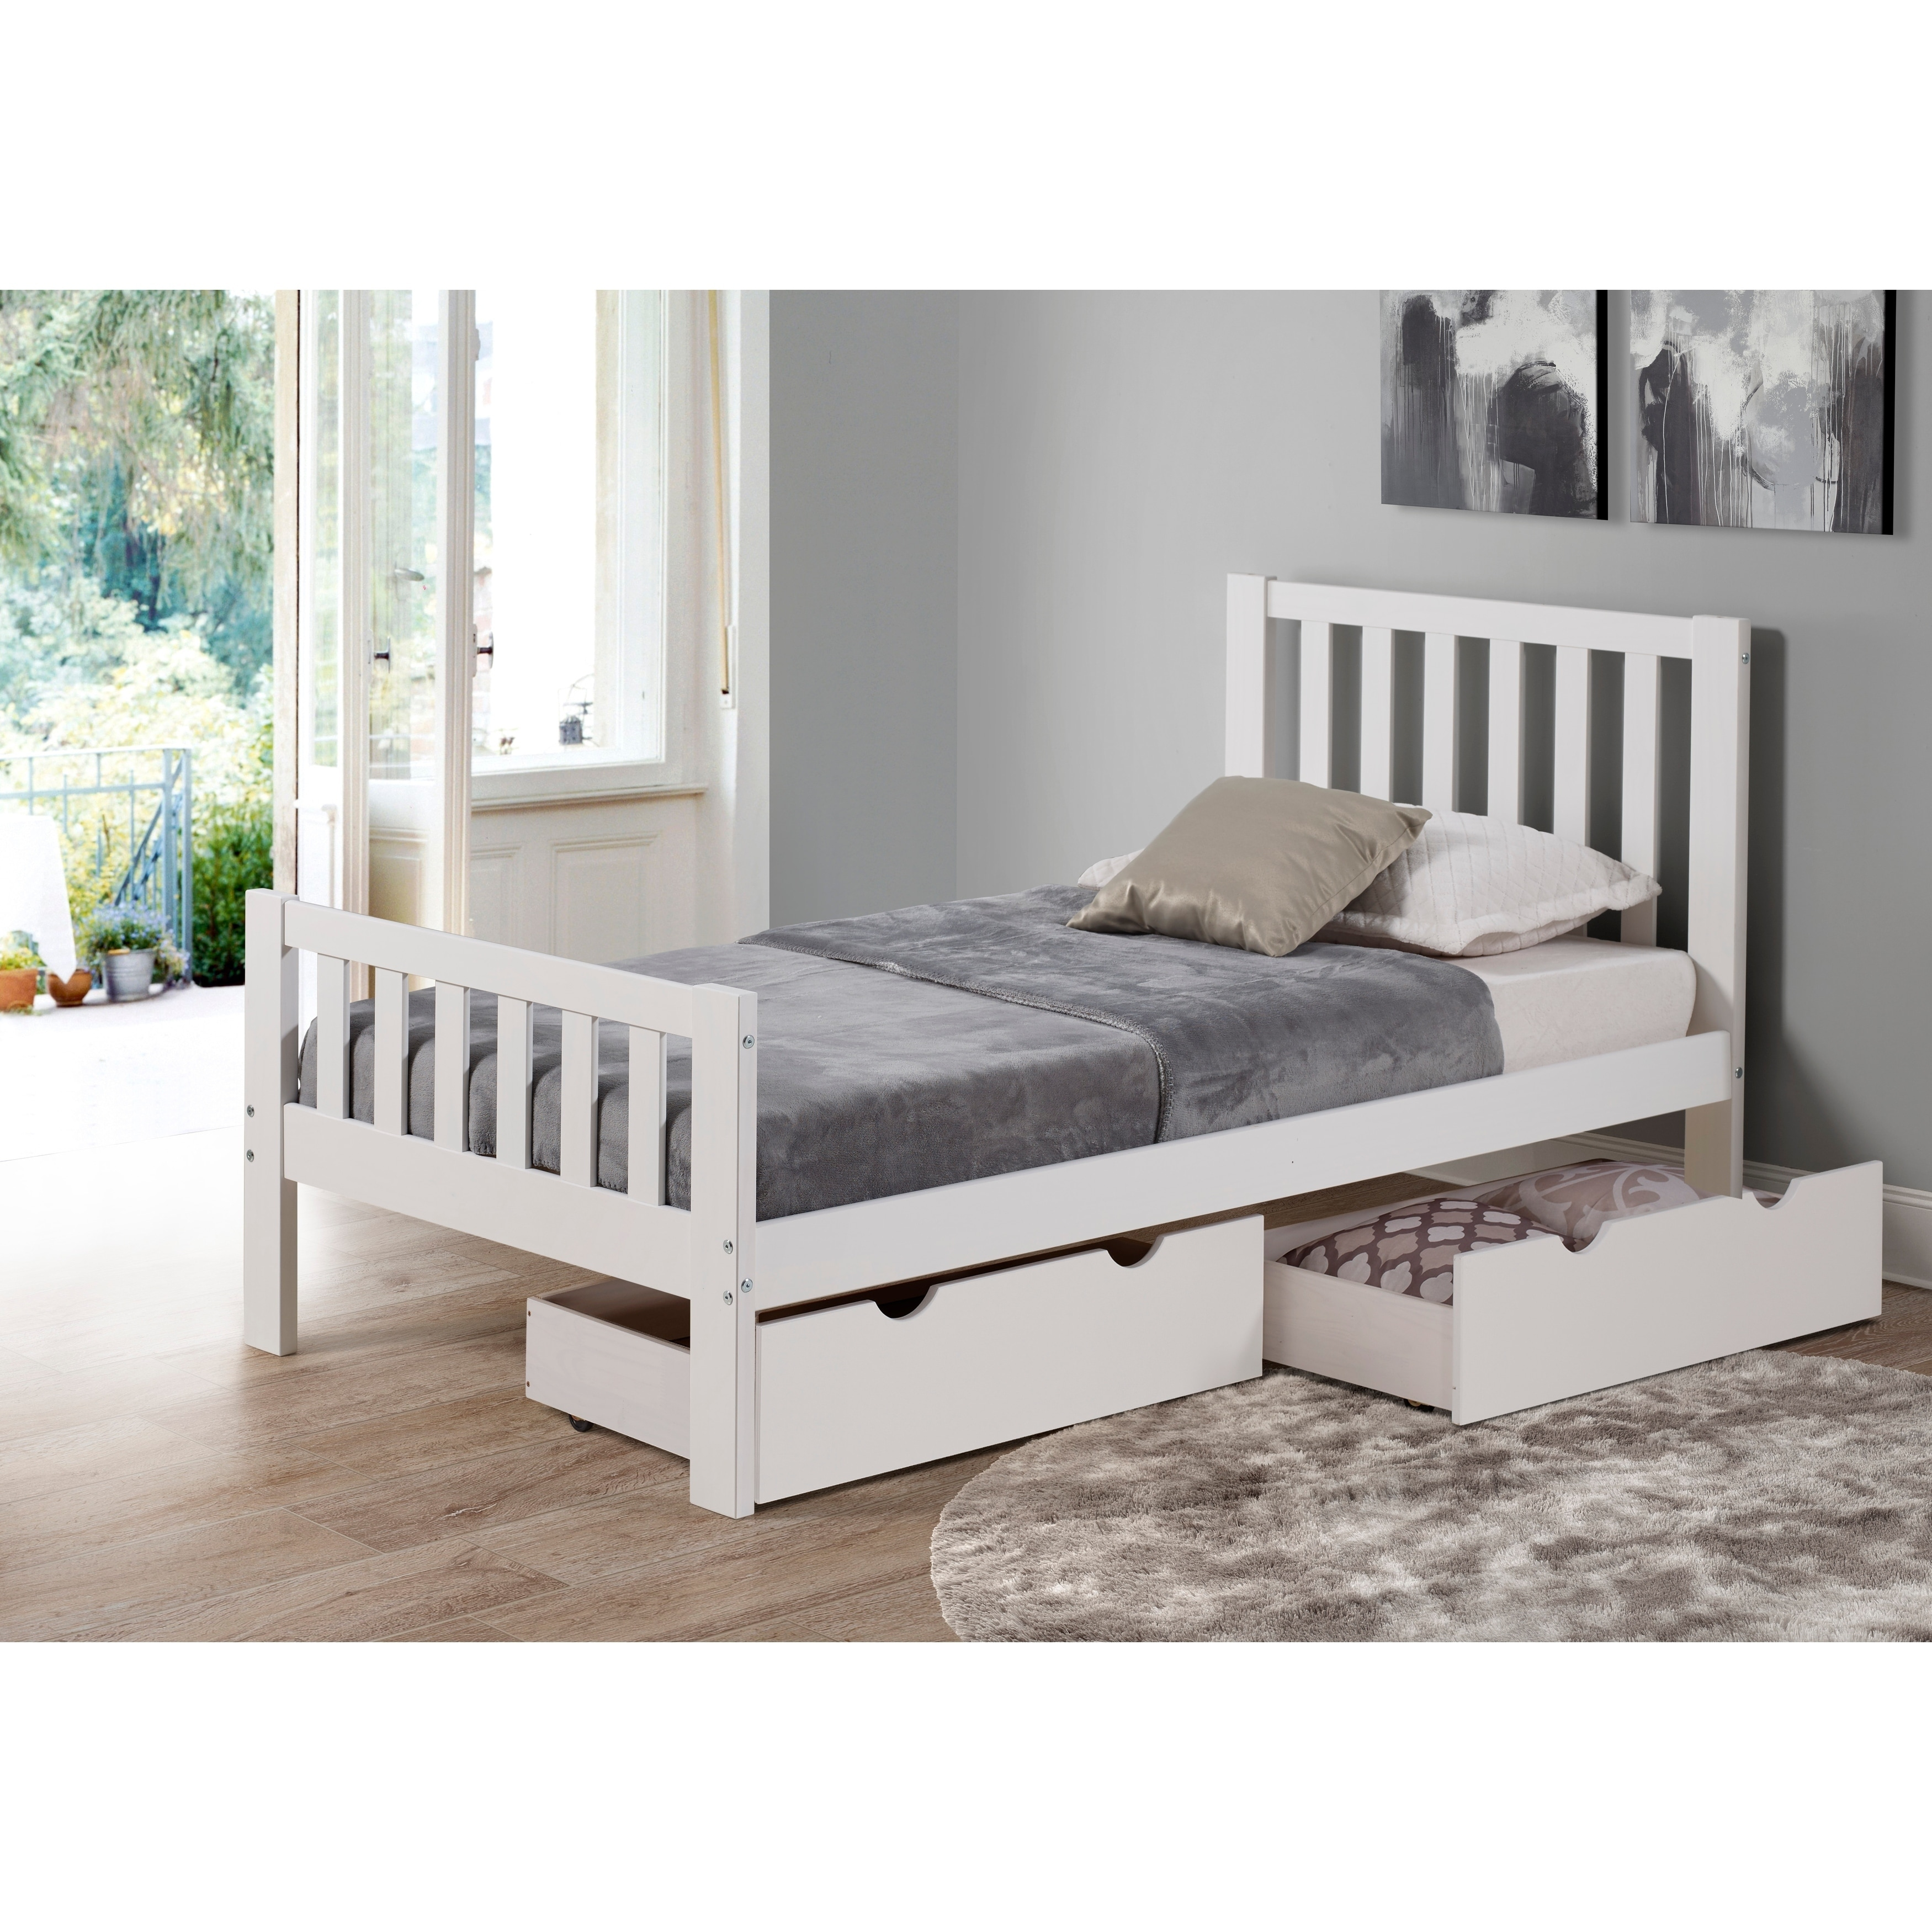 Image of: Shop Black Friday Deals On Alaterre Under Bed Storage Organizer Drawers Set Of 2 Overstock 26050446